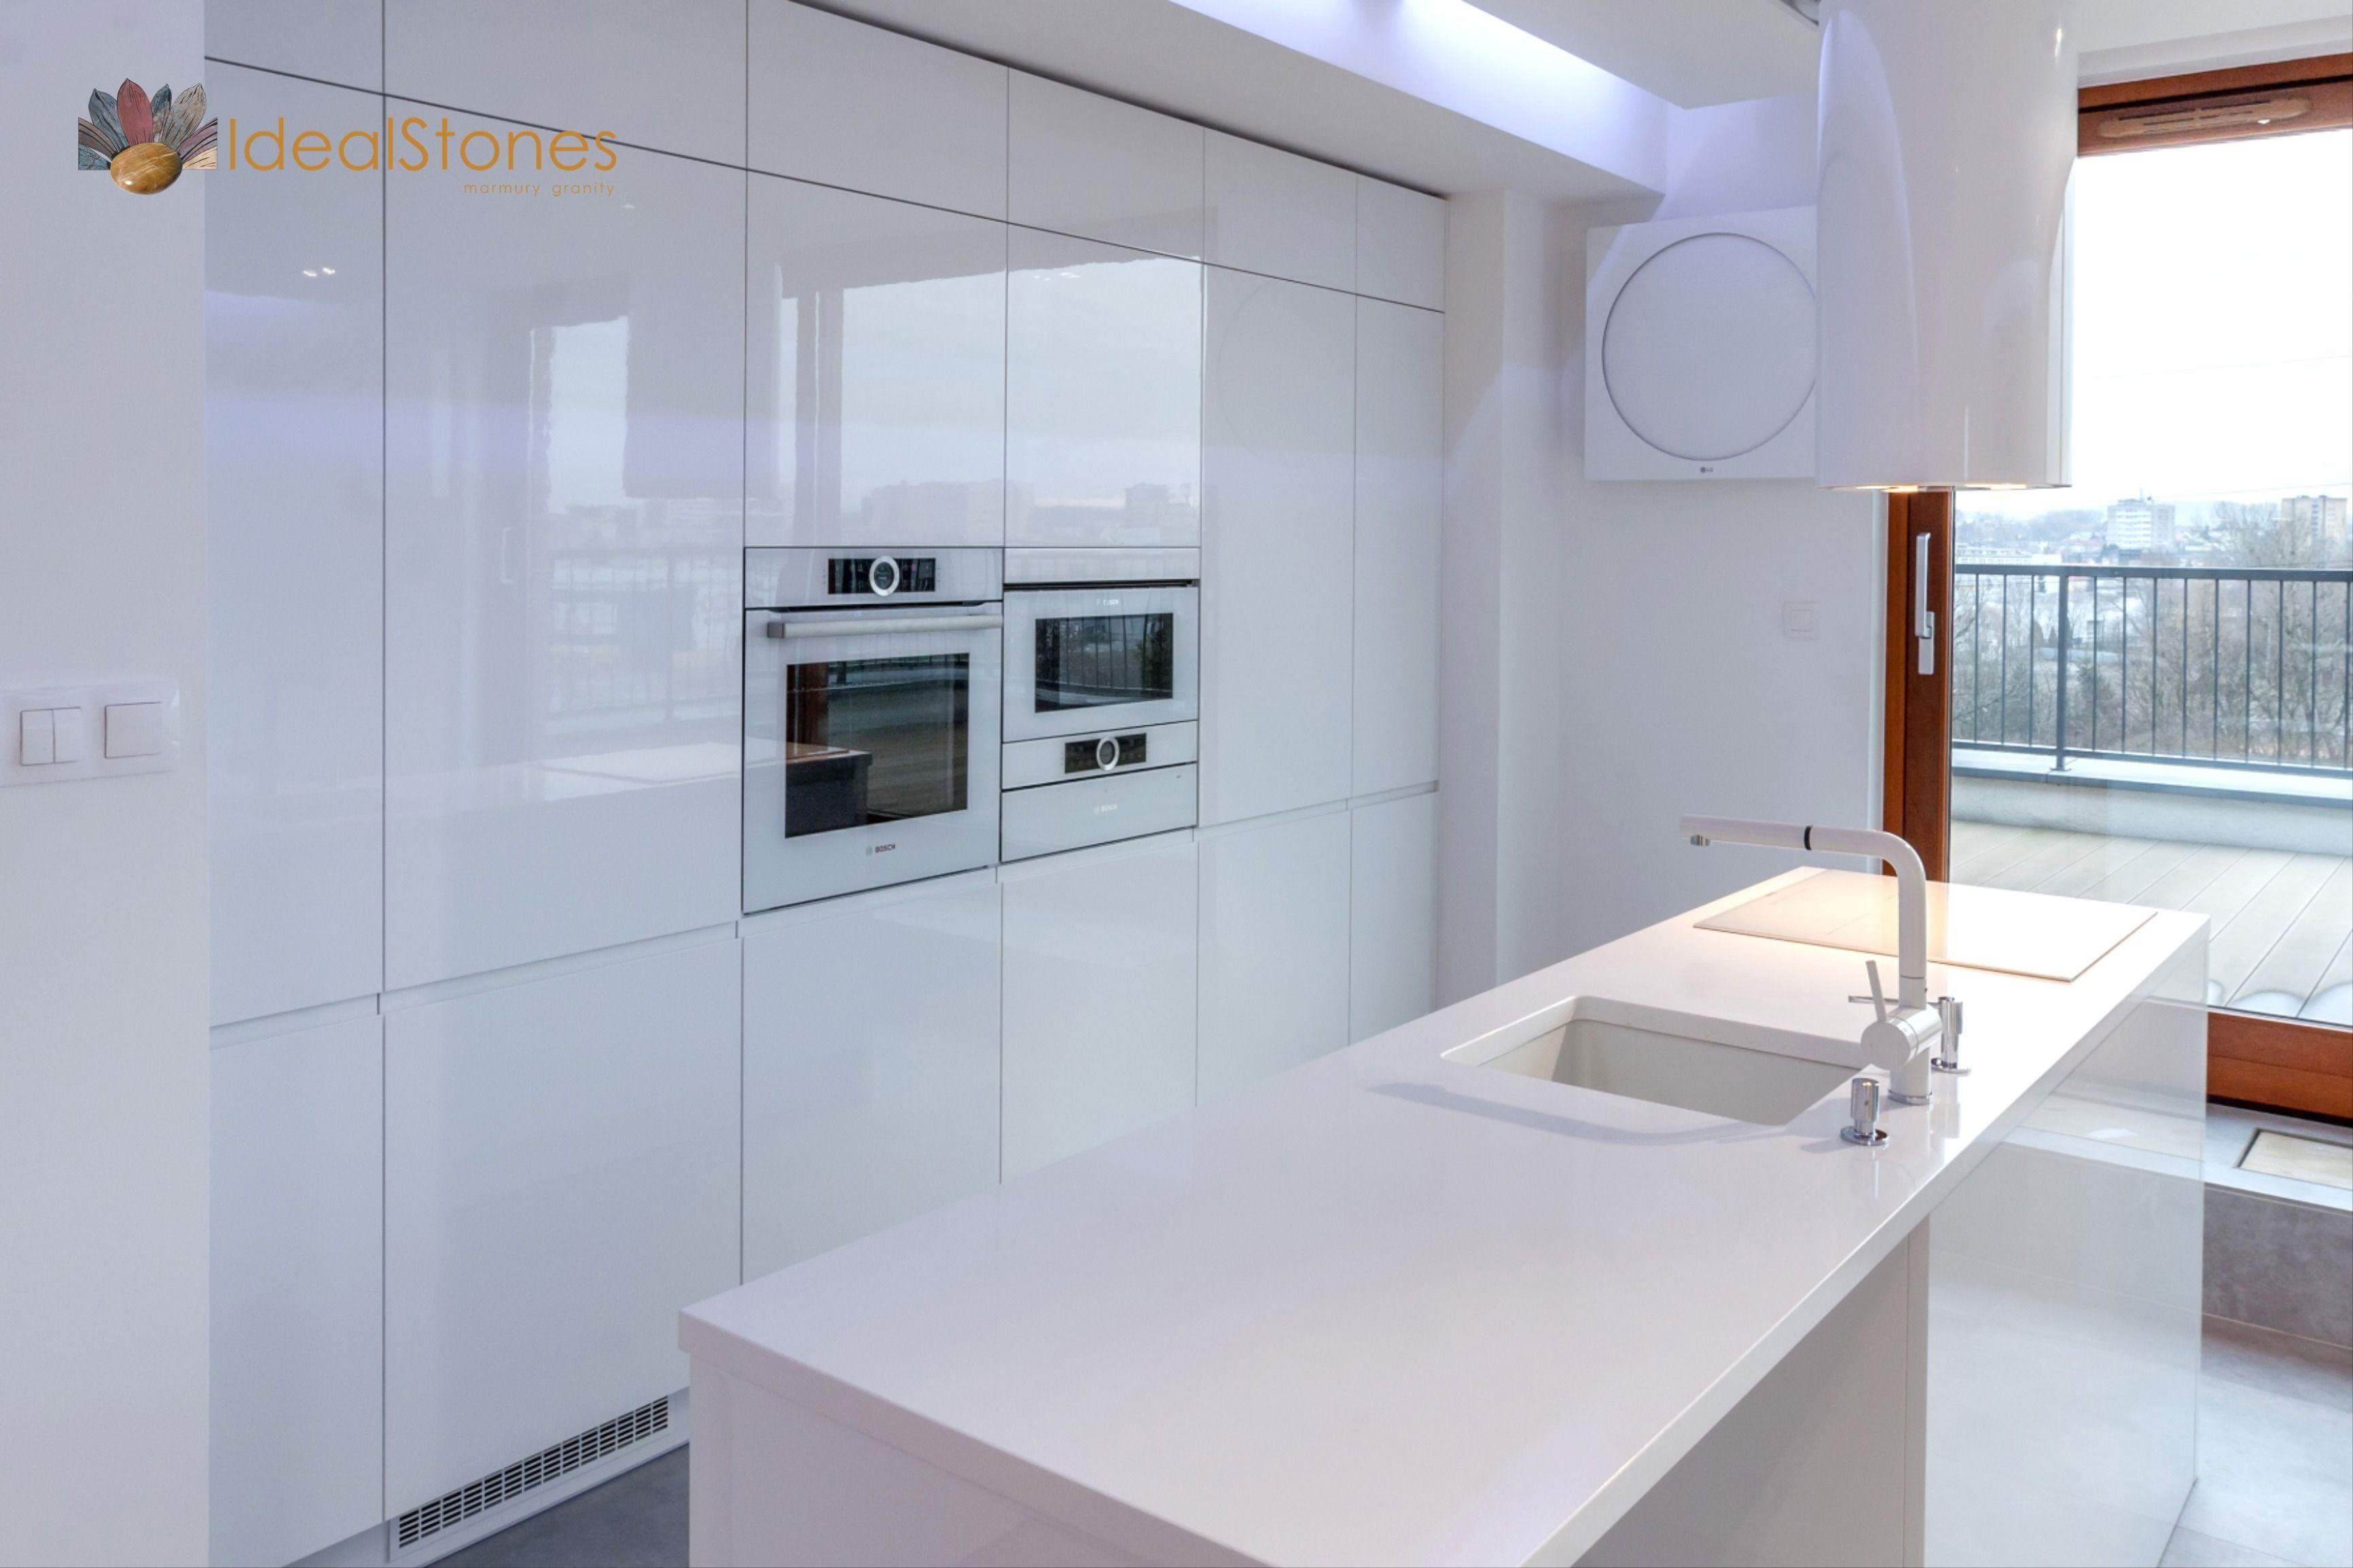 Blat Na Wyspe Kuchenna Z Bialego Kwarcytu Ideal Bianco Lighted Bathroom Mirror Bathroom Mirror Bathroom Lighting